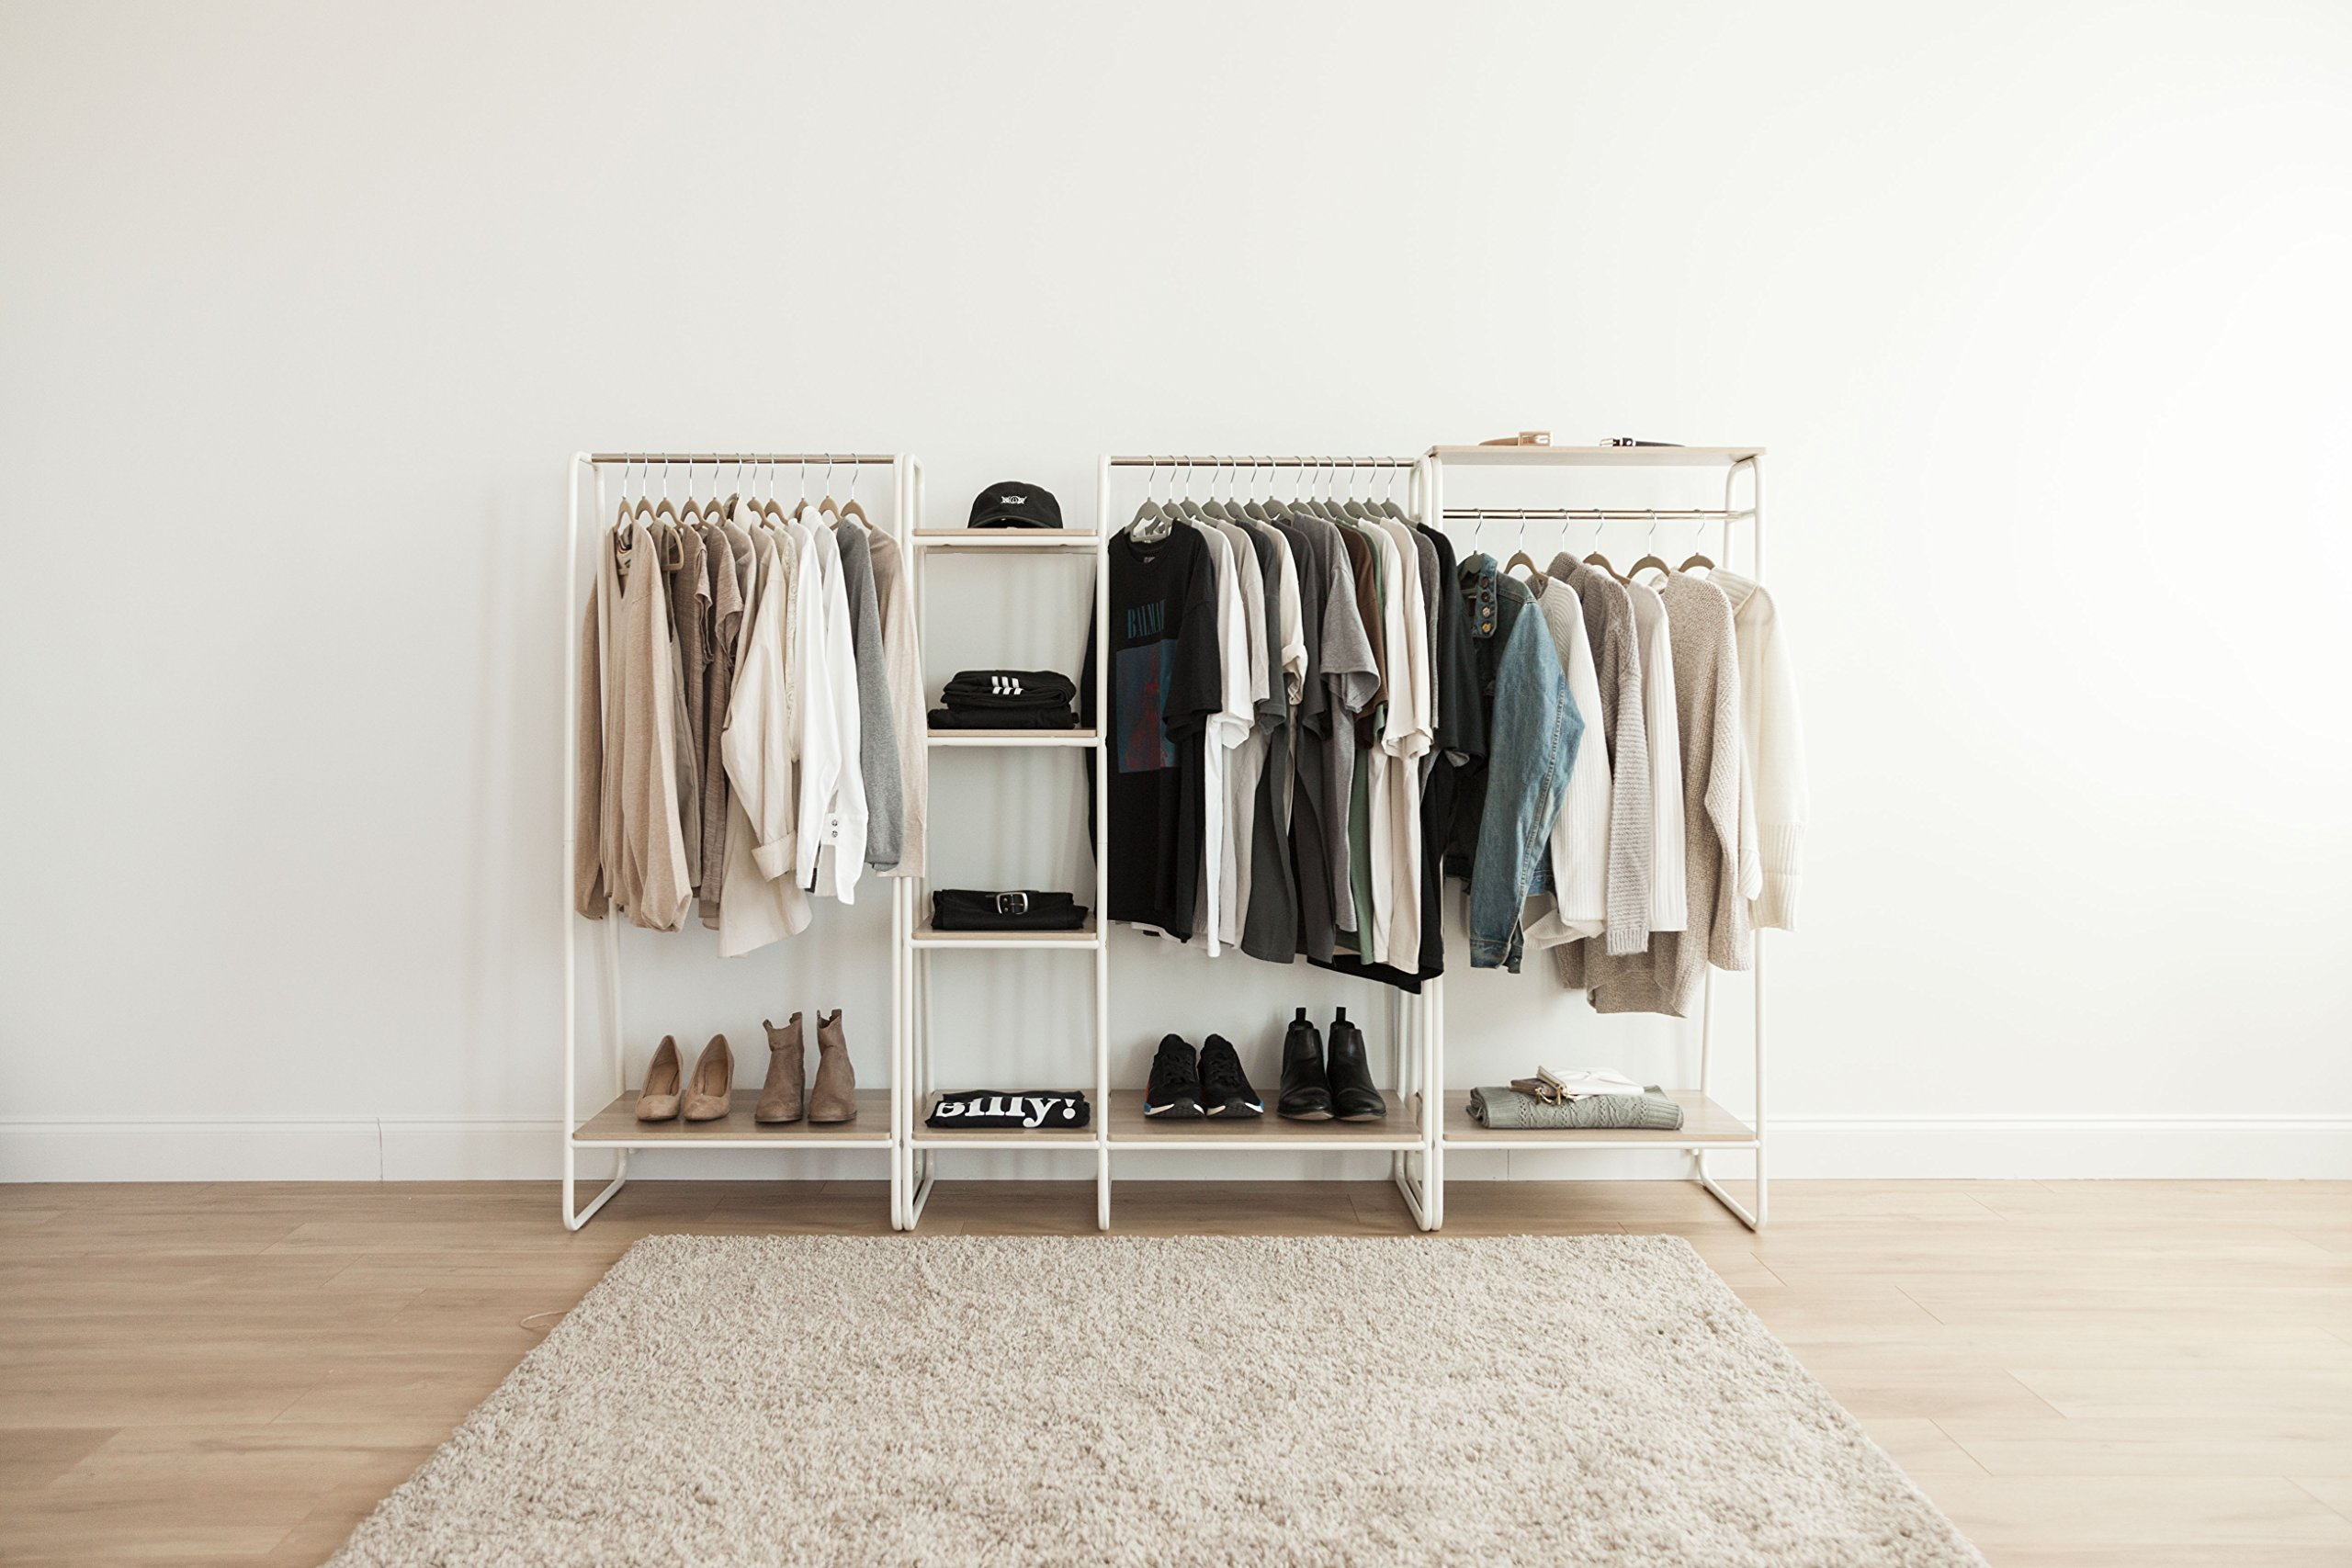 IRIS Metal Garment Rack with 2 Wood Shelves, White and Light Brown by IRIS USA, Inc. (Image #6)